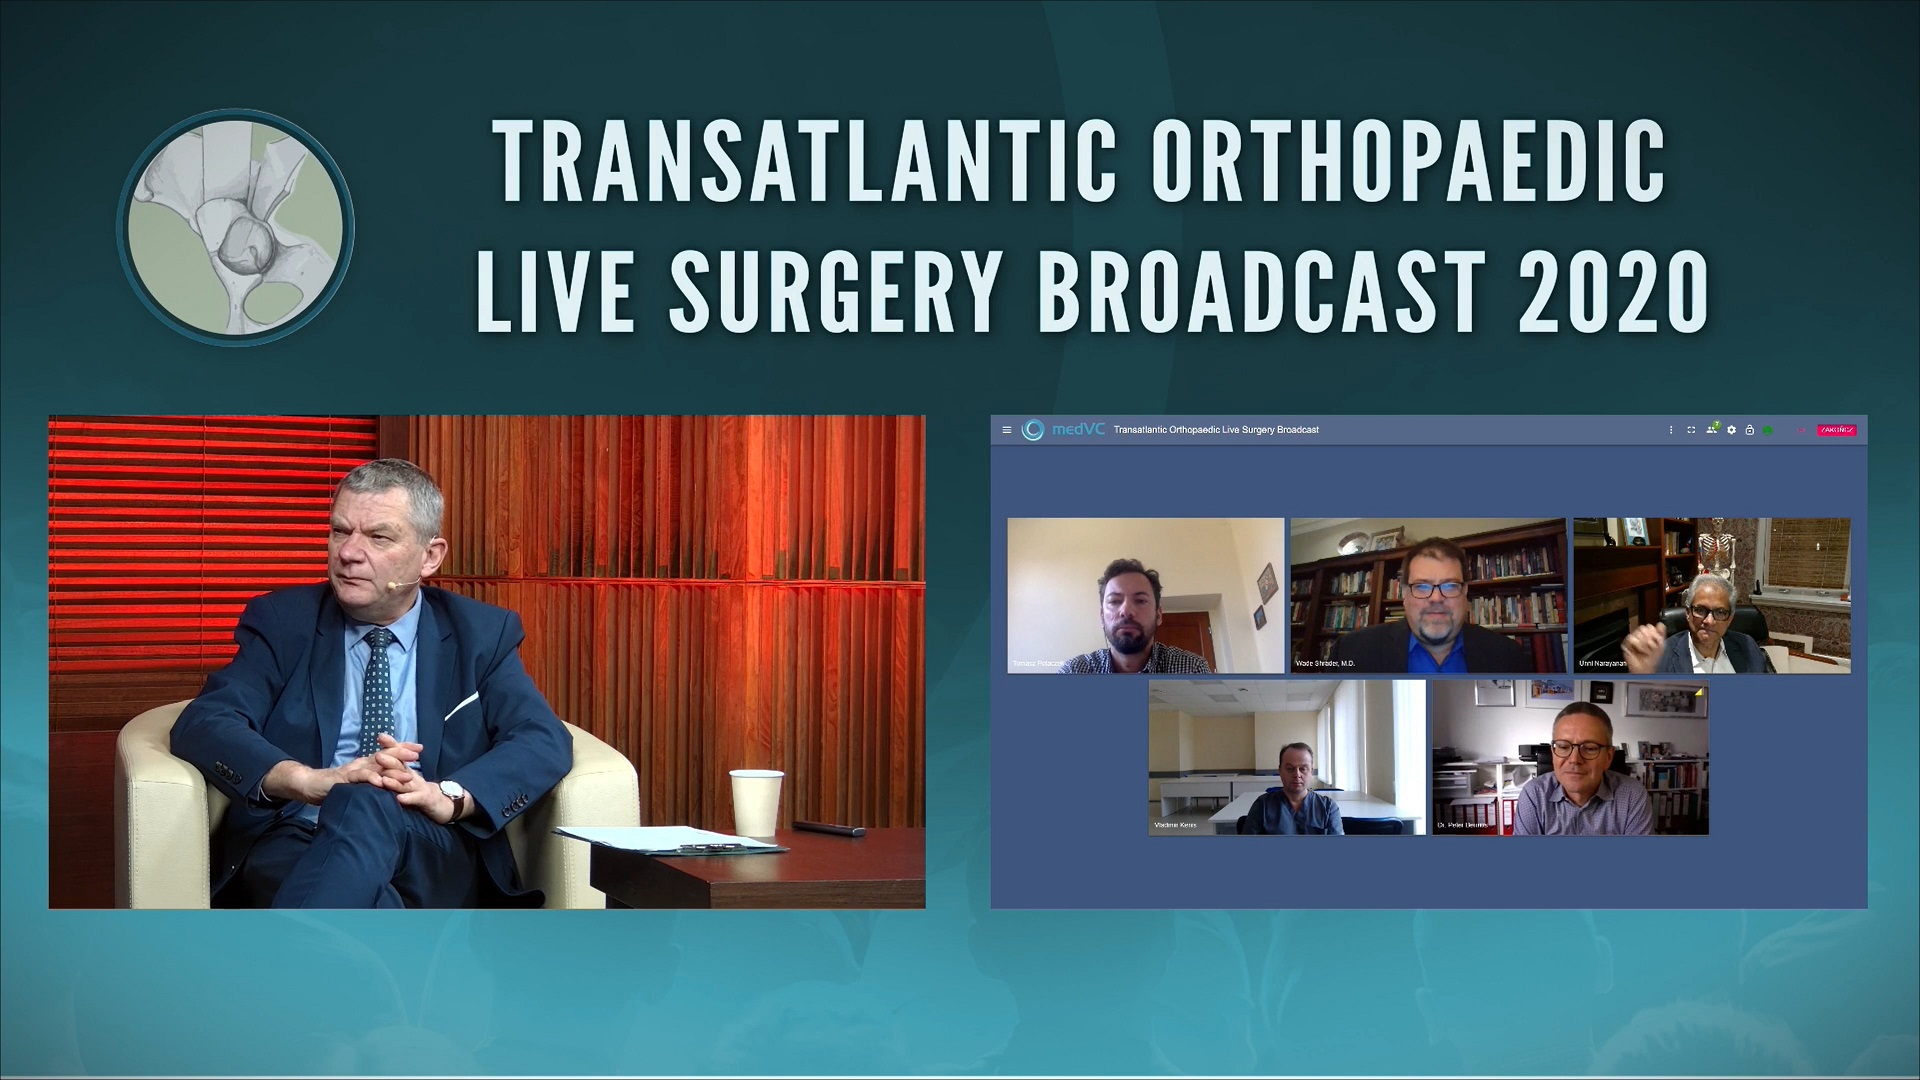 Orthopedic Live Surgery Broadcast 2020 from PSNC studio